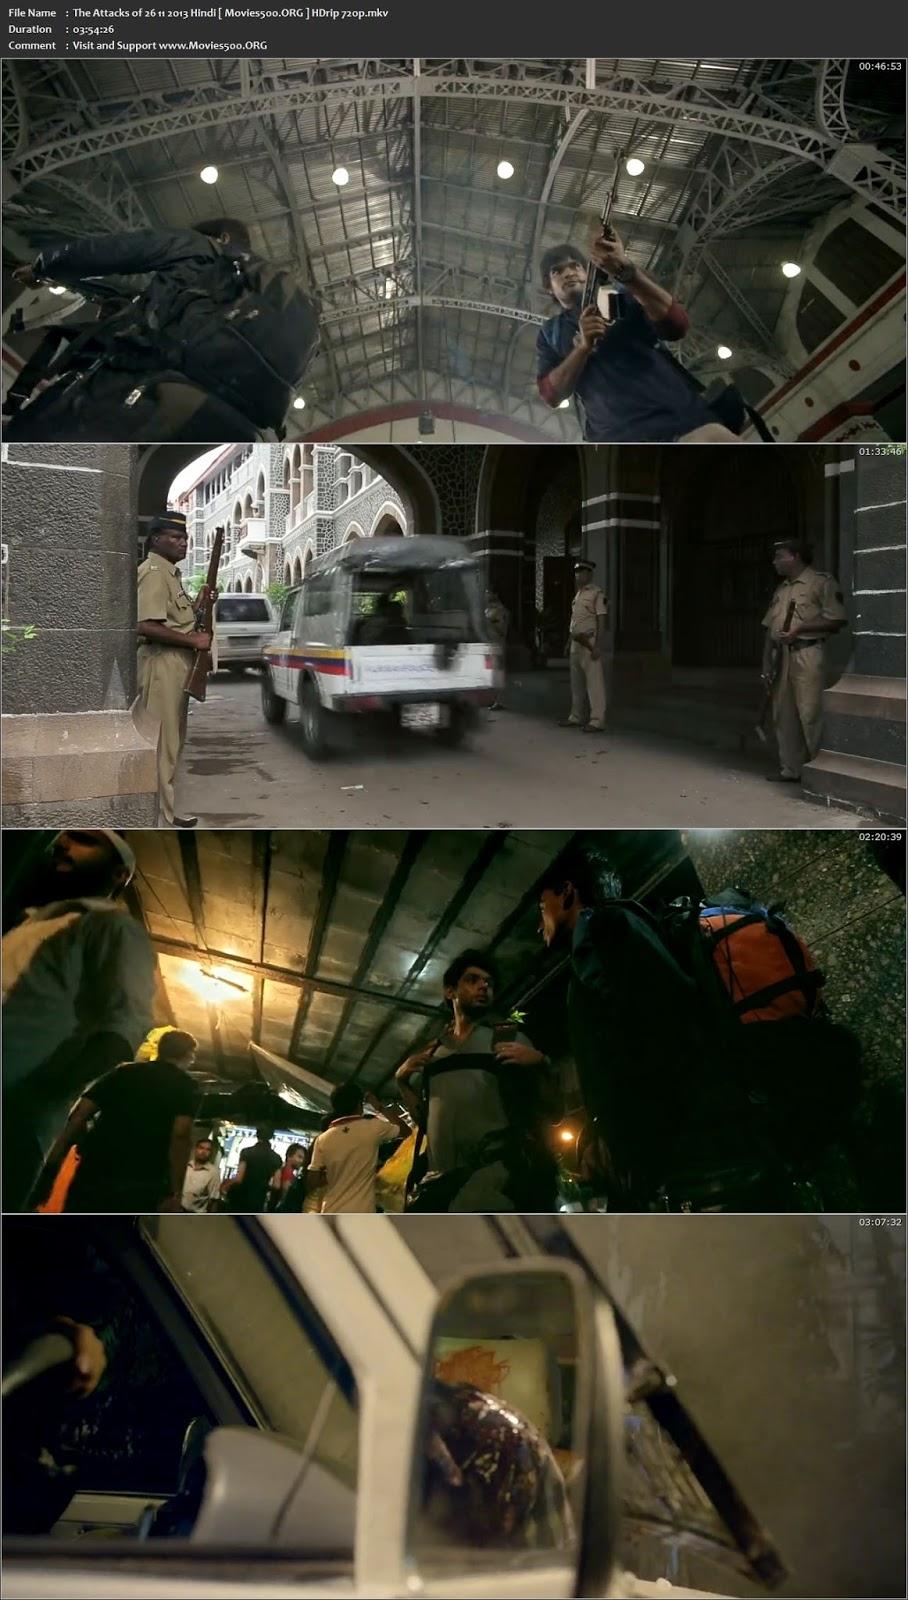 The Attacks of 26 11 2013 Hindi Download HDRip 720p at xcharge.net